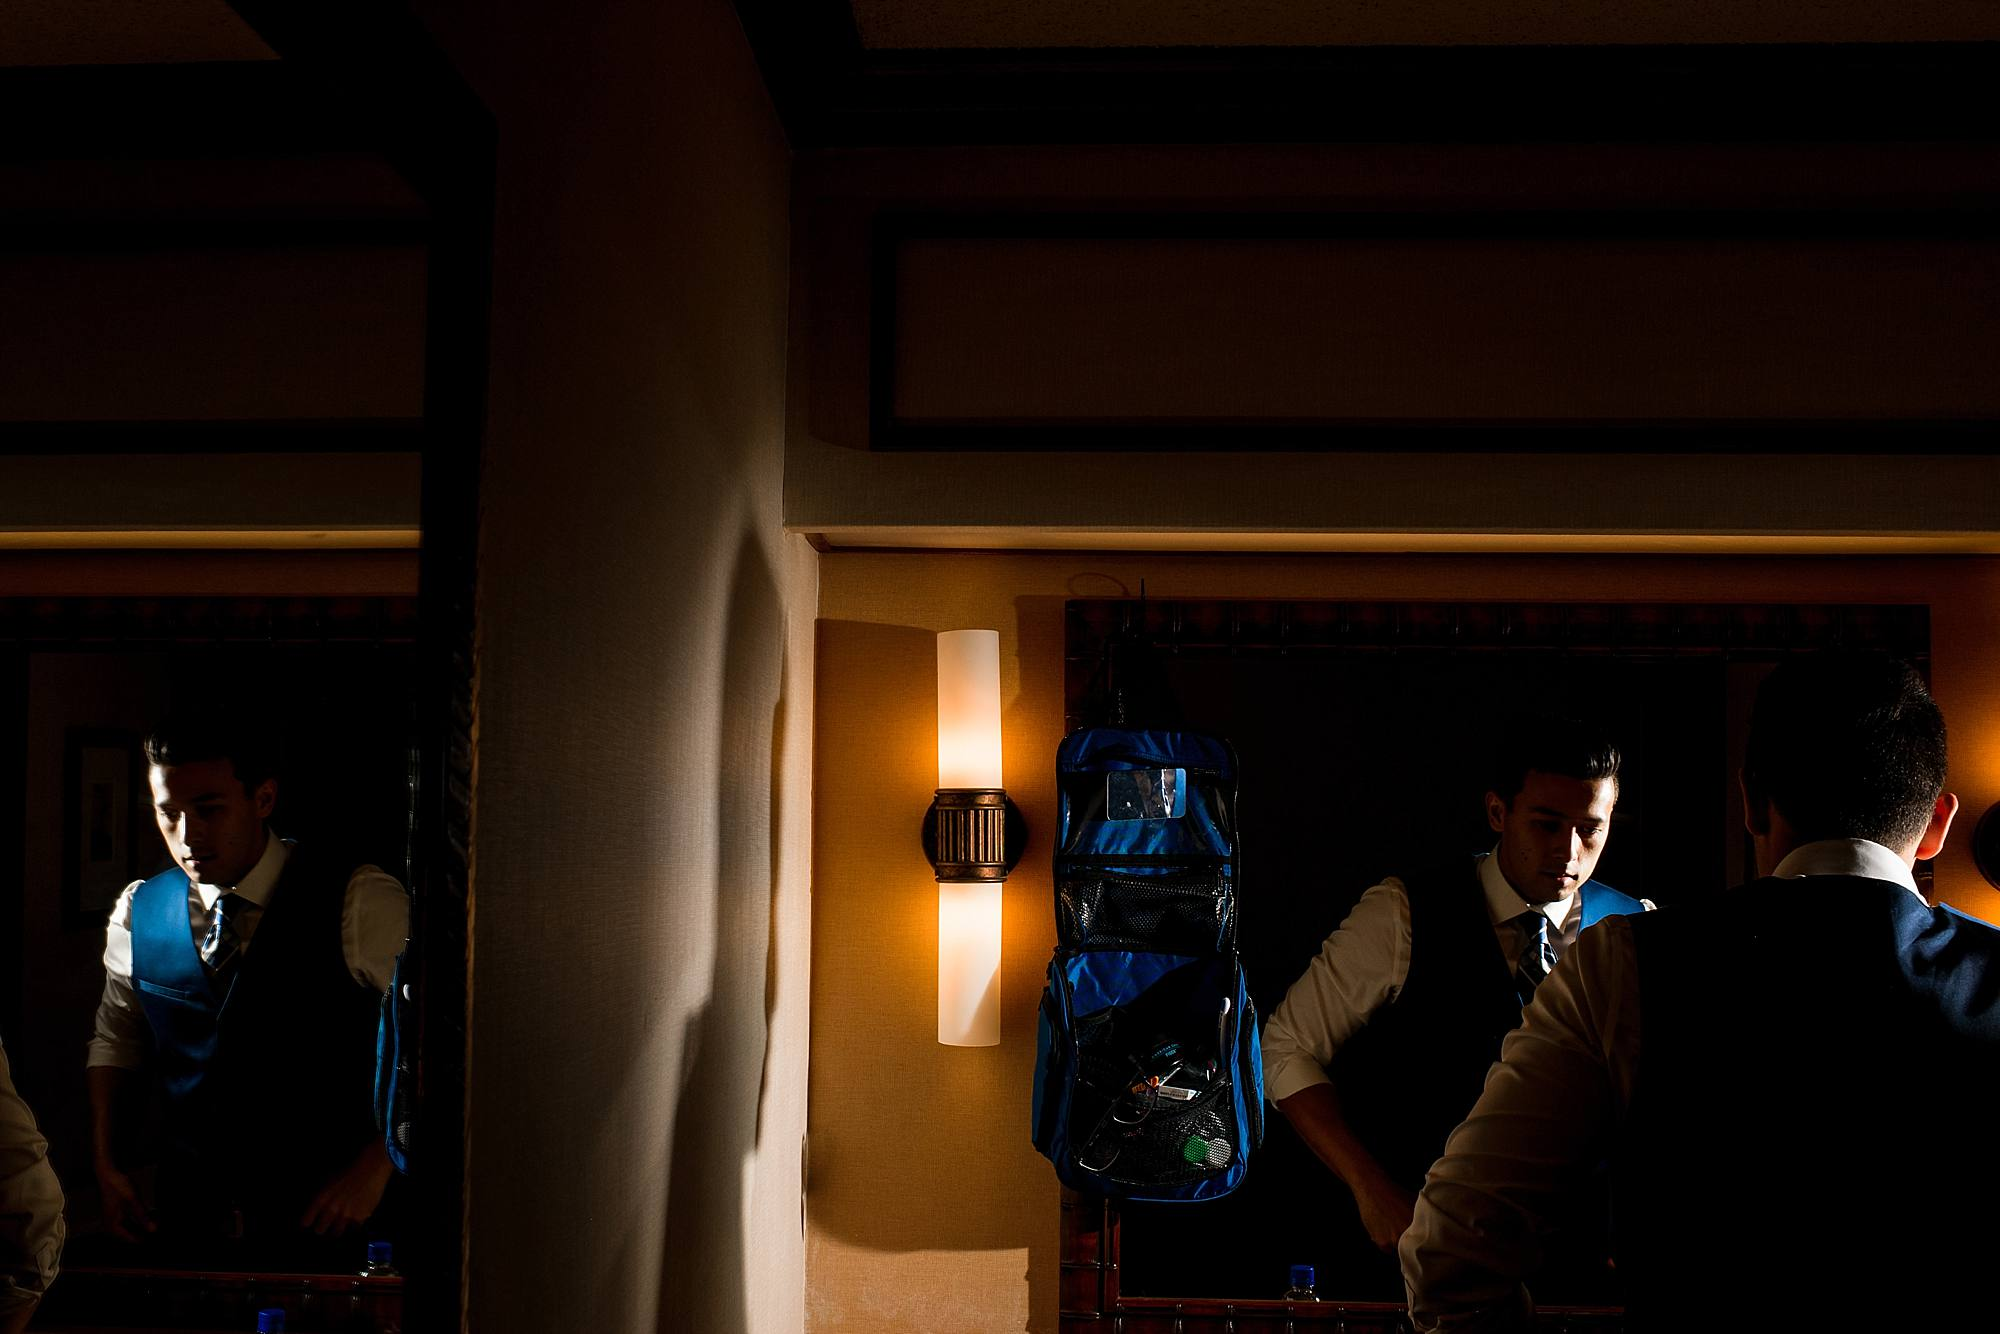 groom getting ready in hotel room